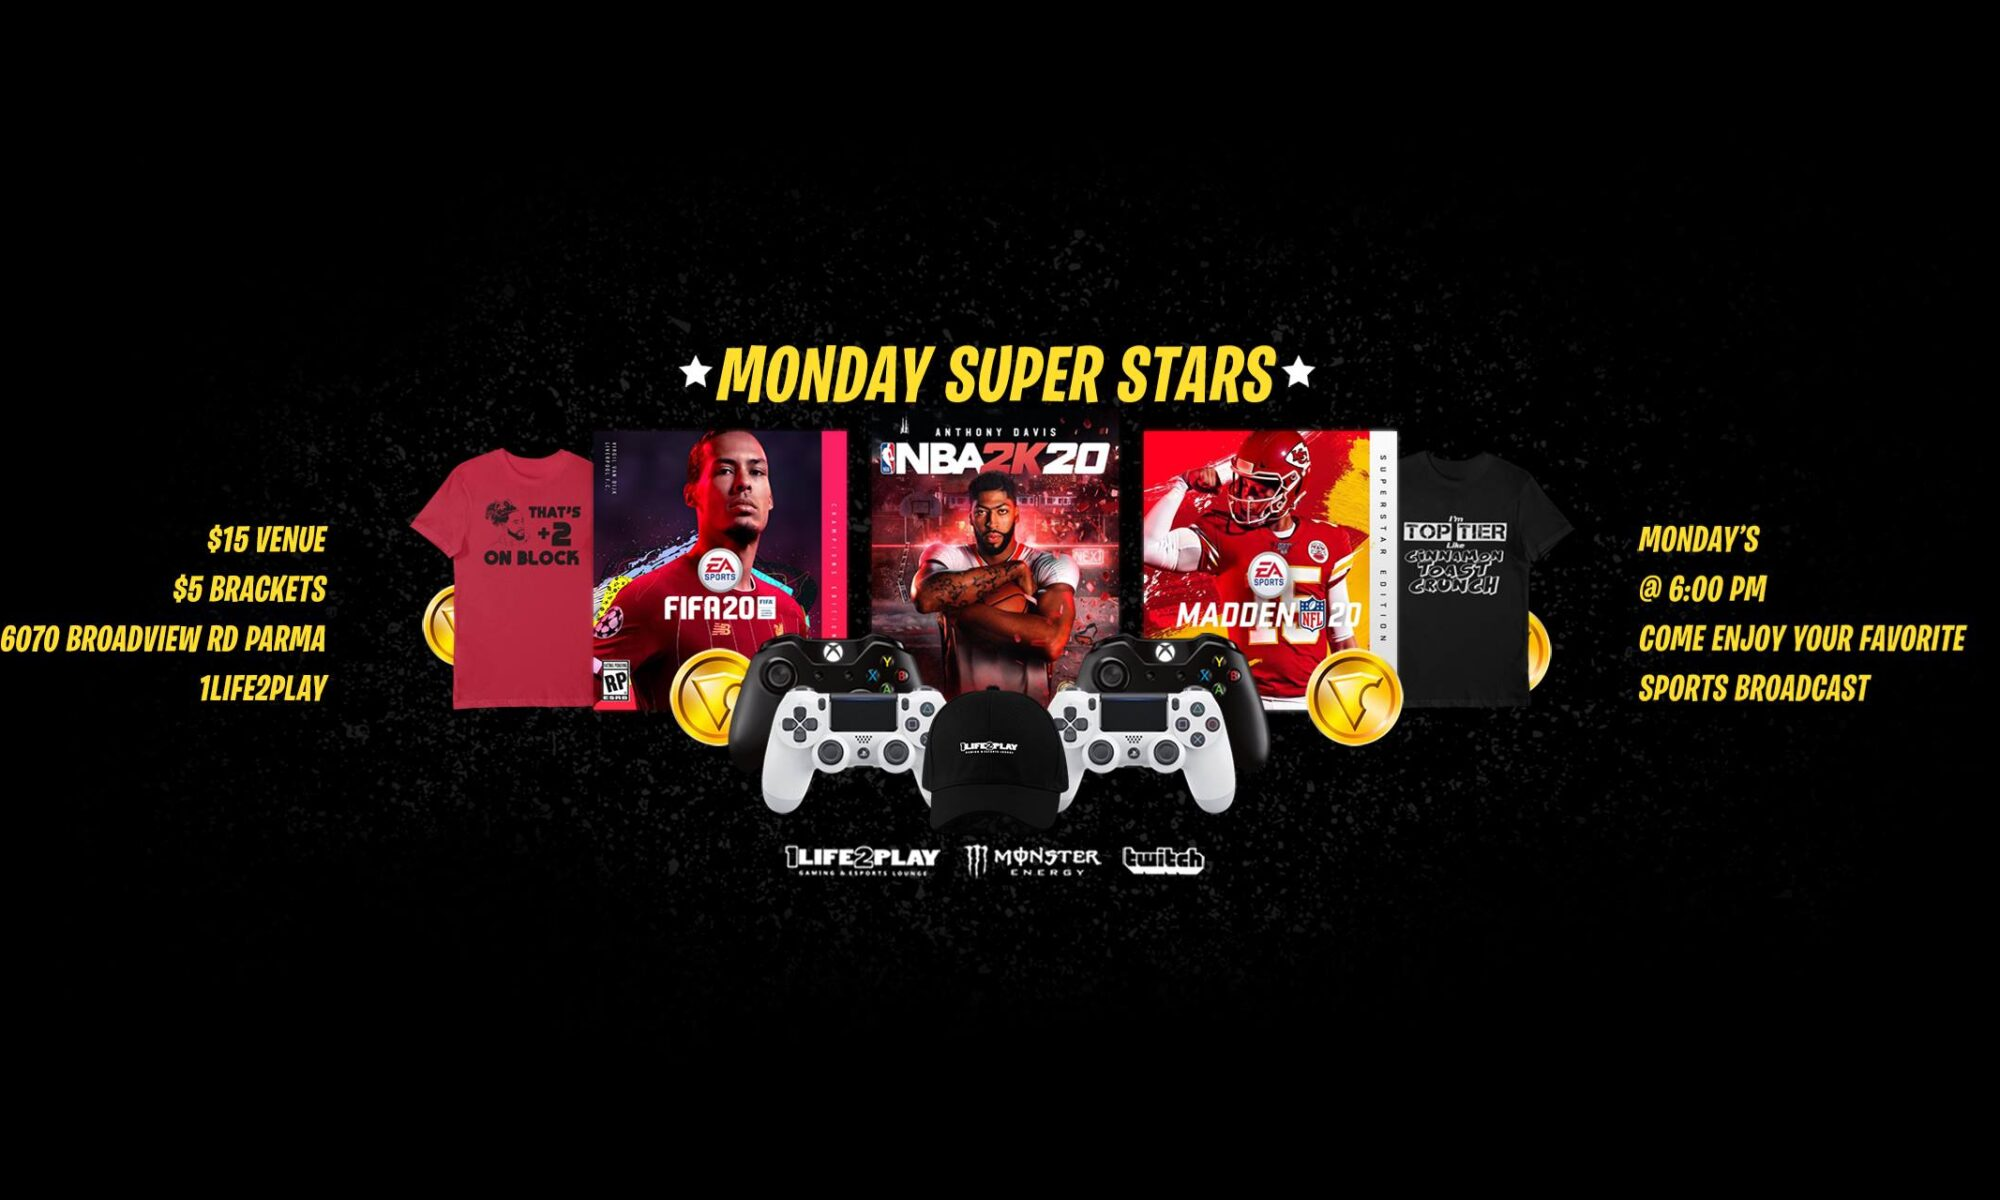 - 1831 image 127188638 4008317552529193 2389227684686986748 n 2000x1200 - Monday Super Stars – Sports Games Weekly at 1Life2Play